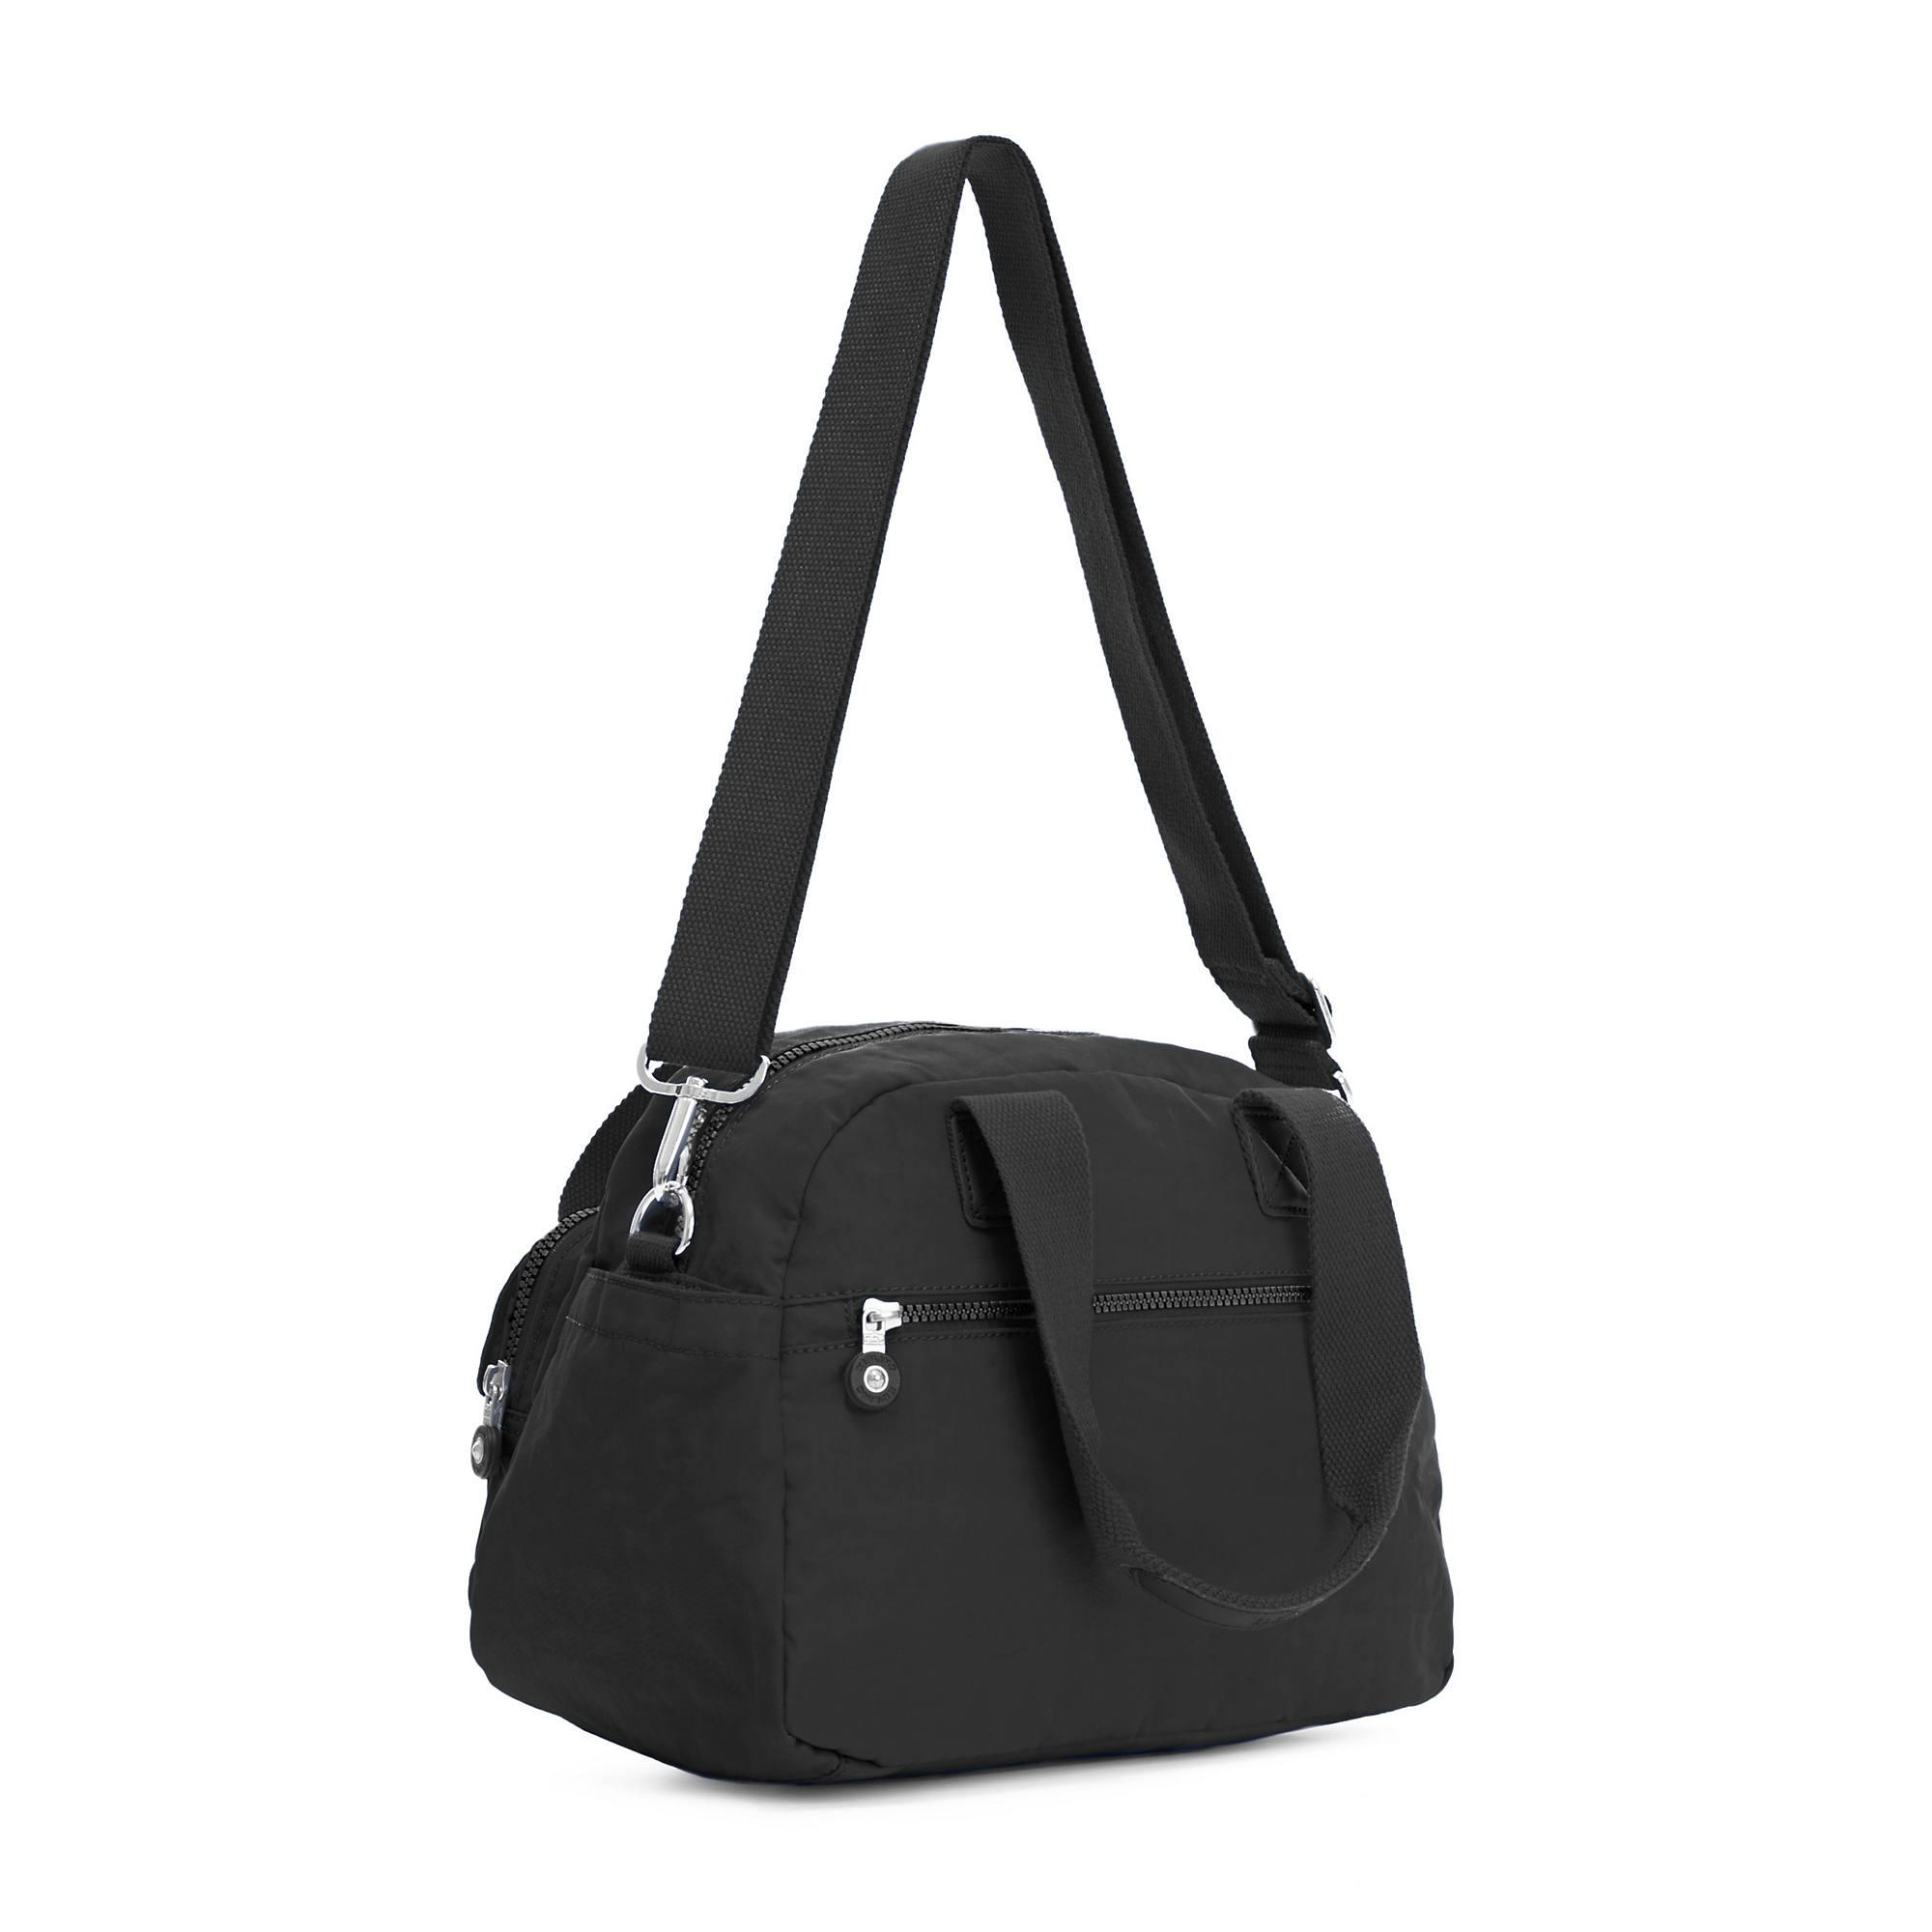 bbba7526b Defea Handbag,True Black,large